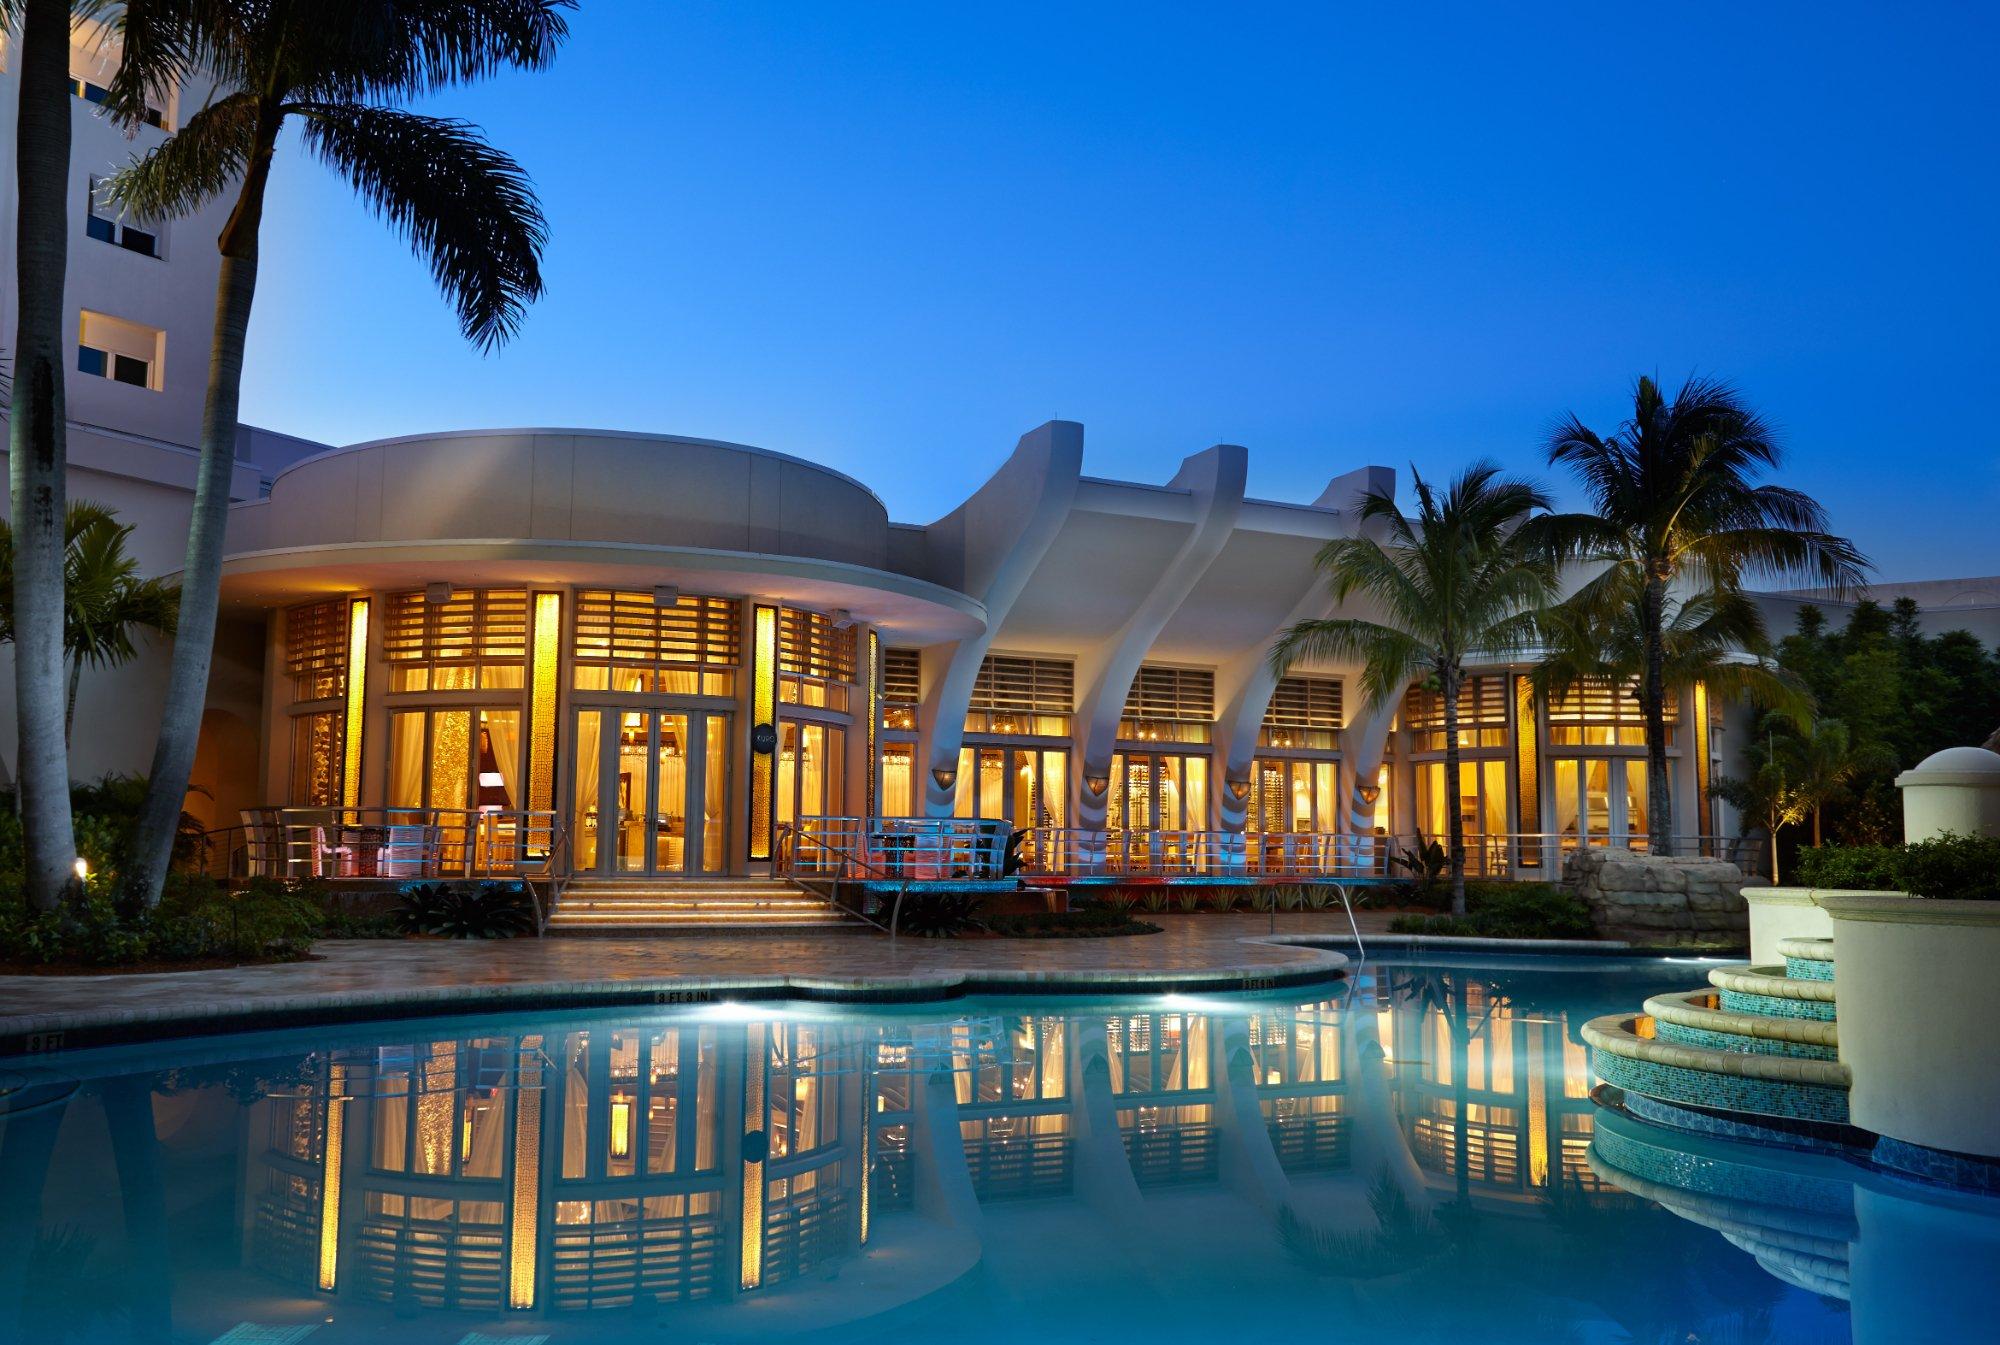 Florida hard rock casino age